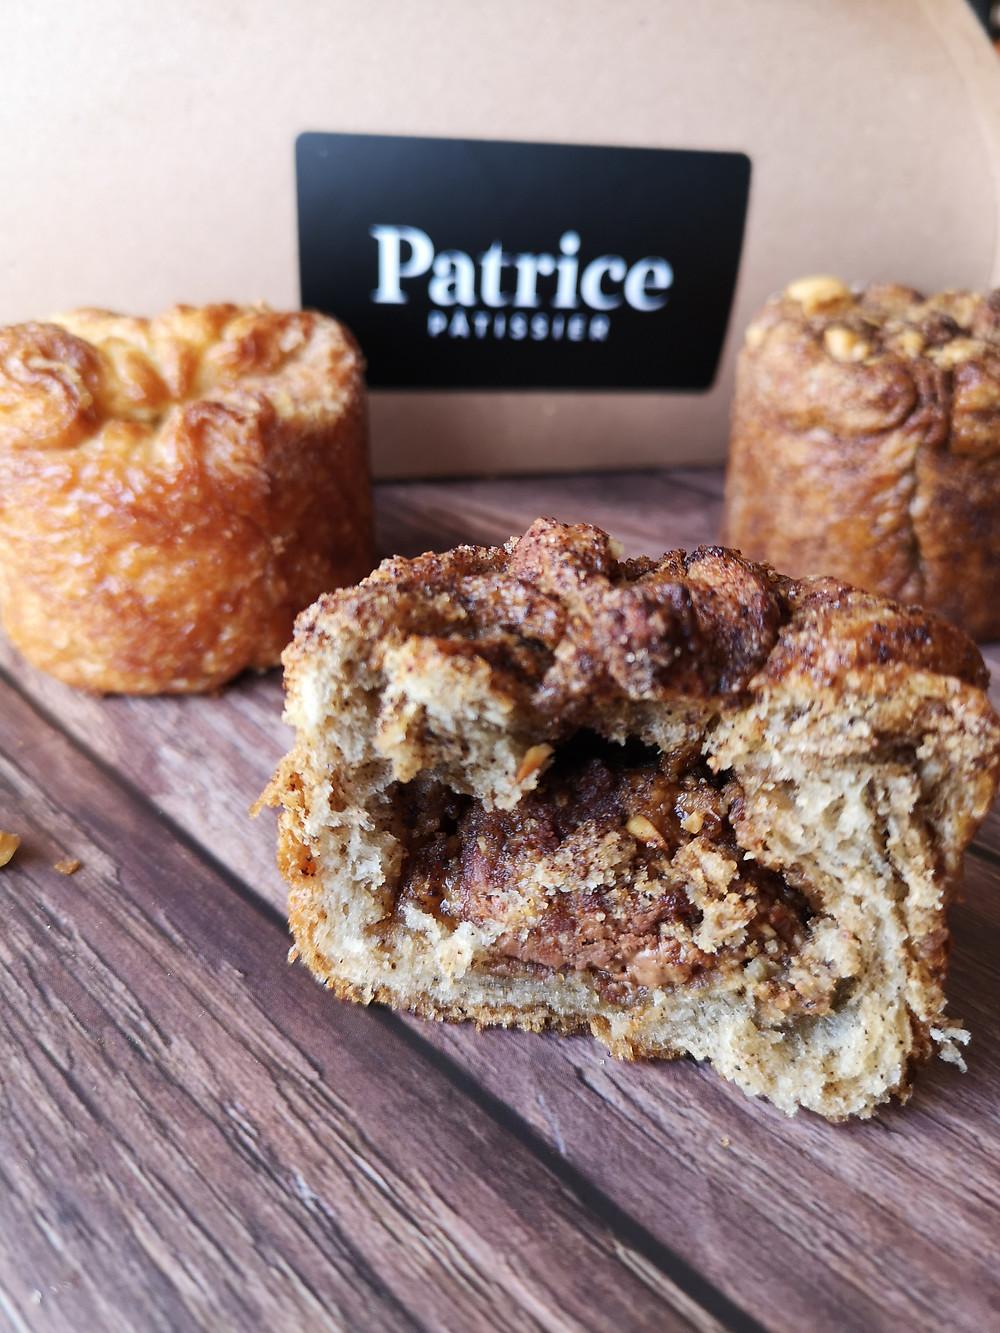 Desserts Patrice Pâtissier